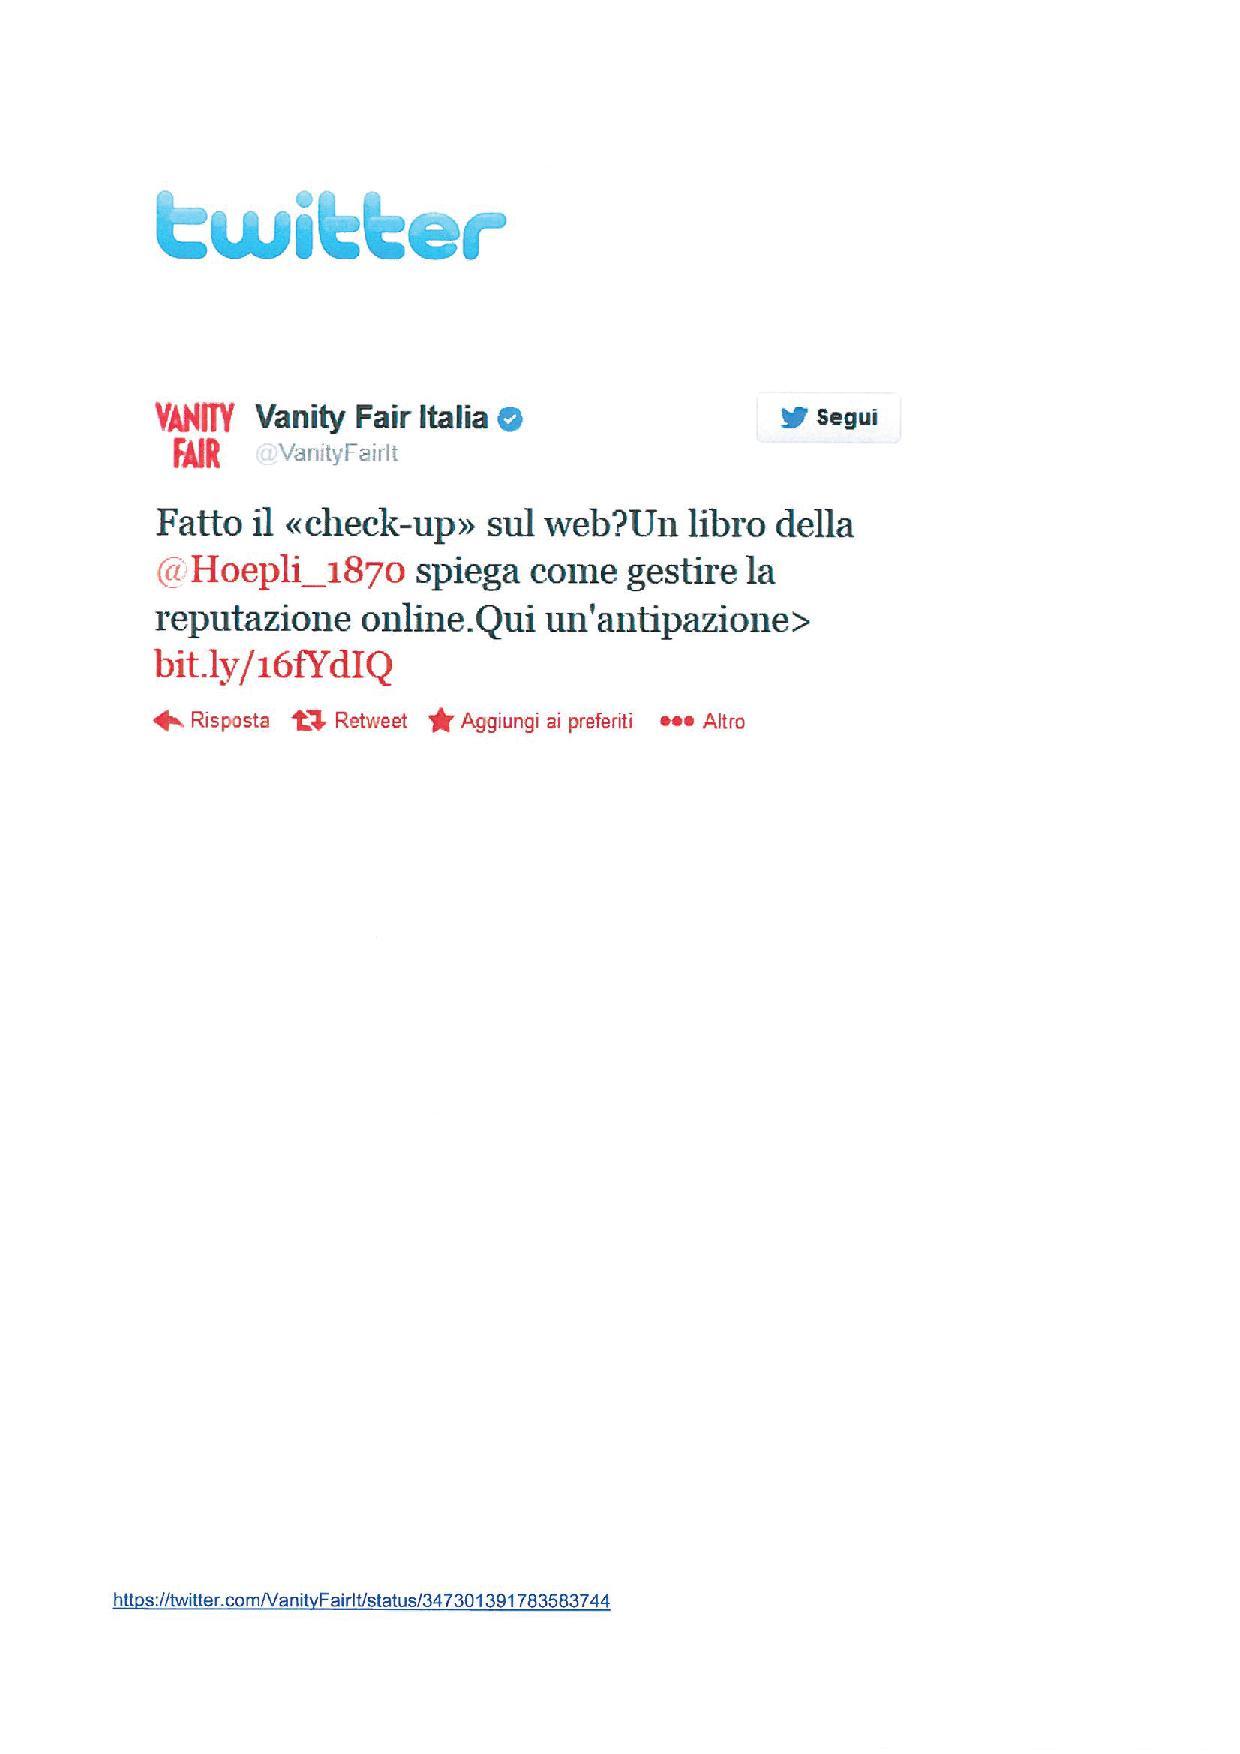 Twitter.com/Vanity Fair Italia, 19 giugno 2013